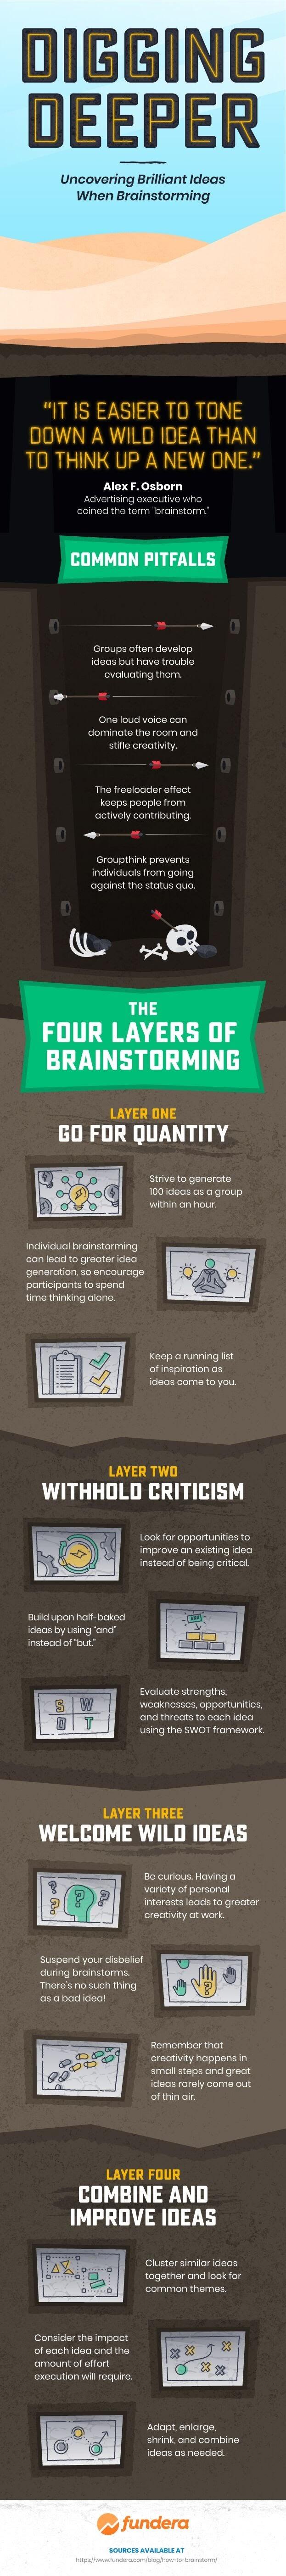 How To Brainstorm Brilliant Ideas (Infographic)